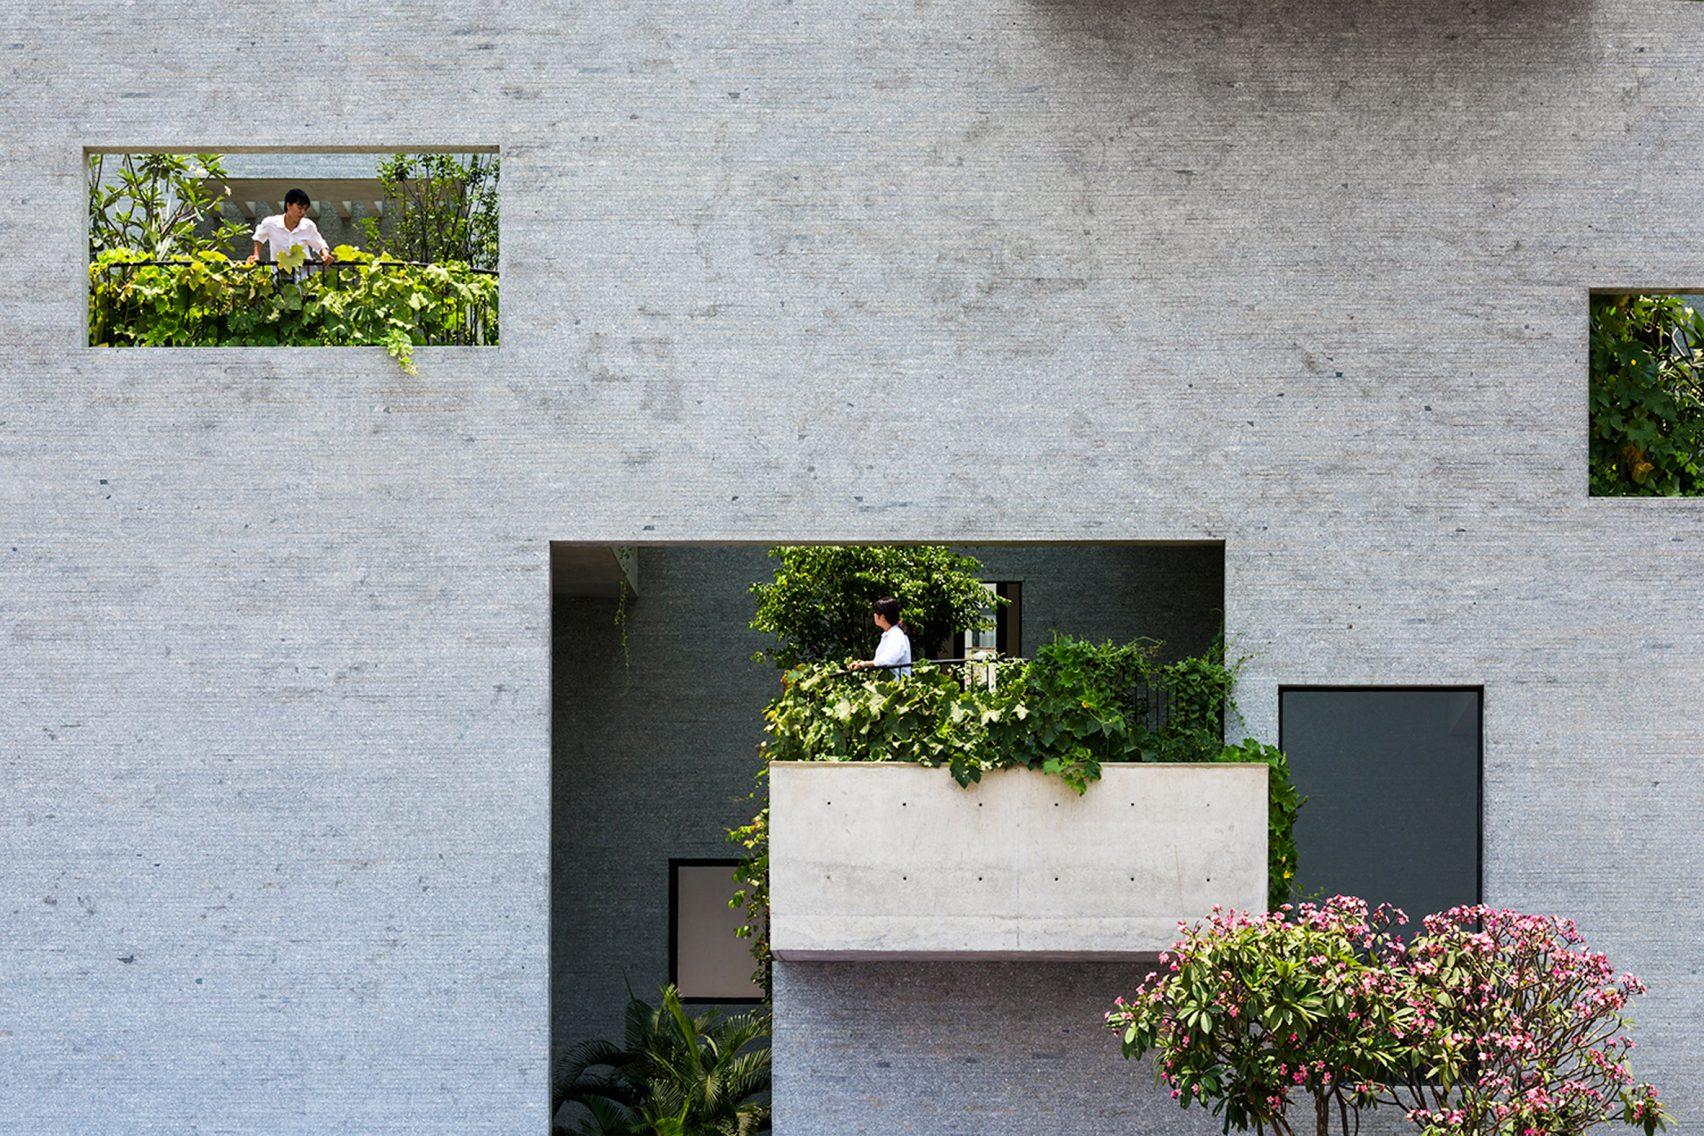 binh-house-vo-trong-nghia-architects-residential-vietnam_dezeen_2364_col_3-1704x1136.jpg